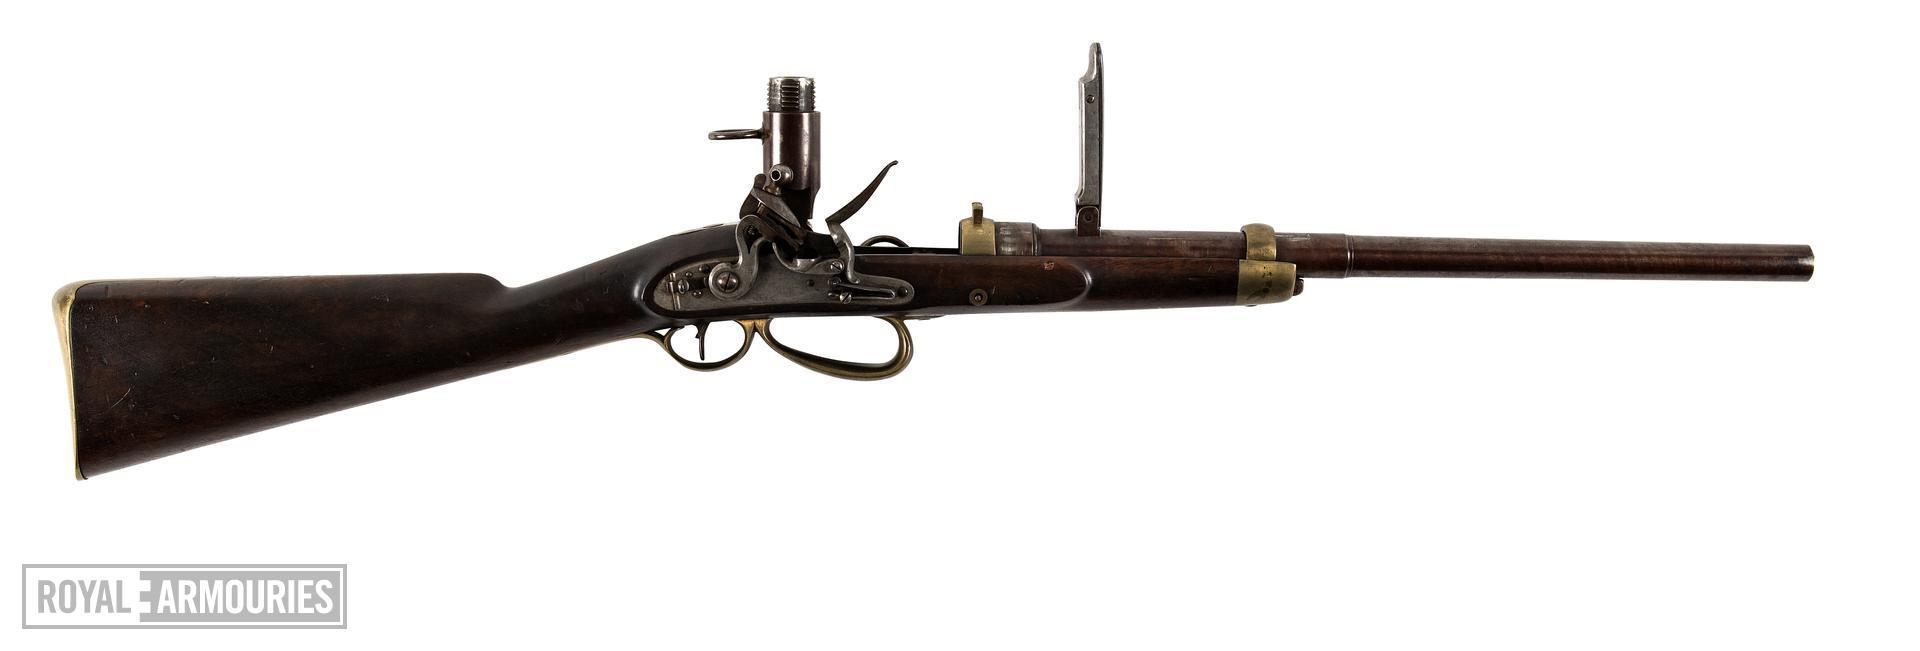 Sartorious flintlock breech-loading Mk. III Carbine, England, about 1810 (XII.5705)